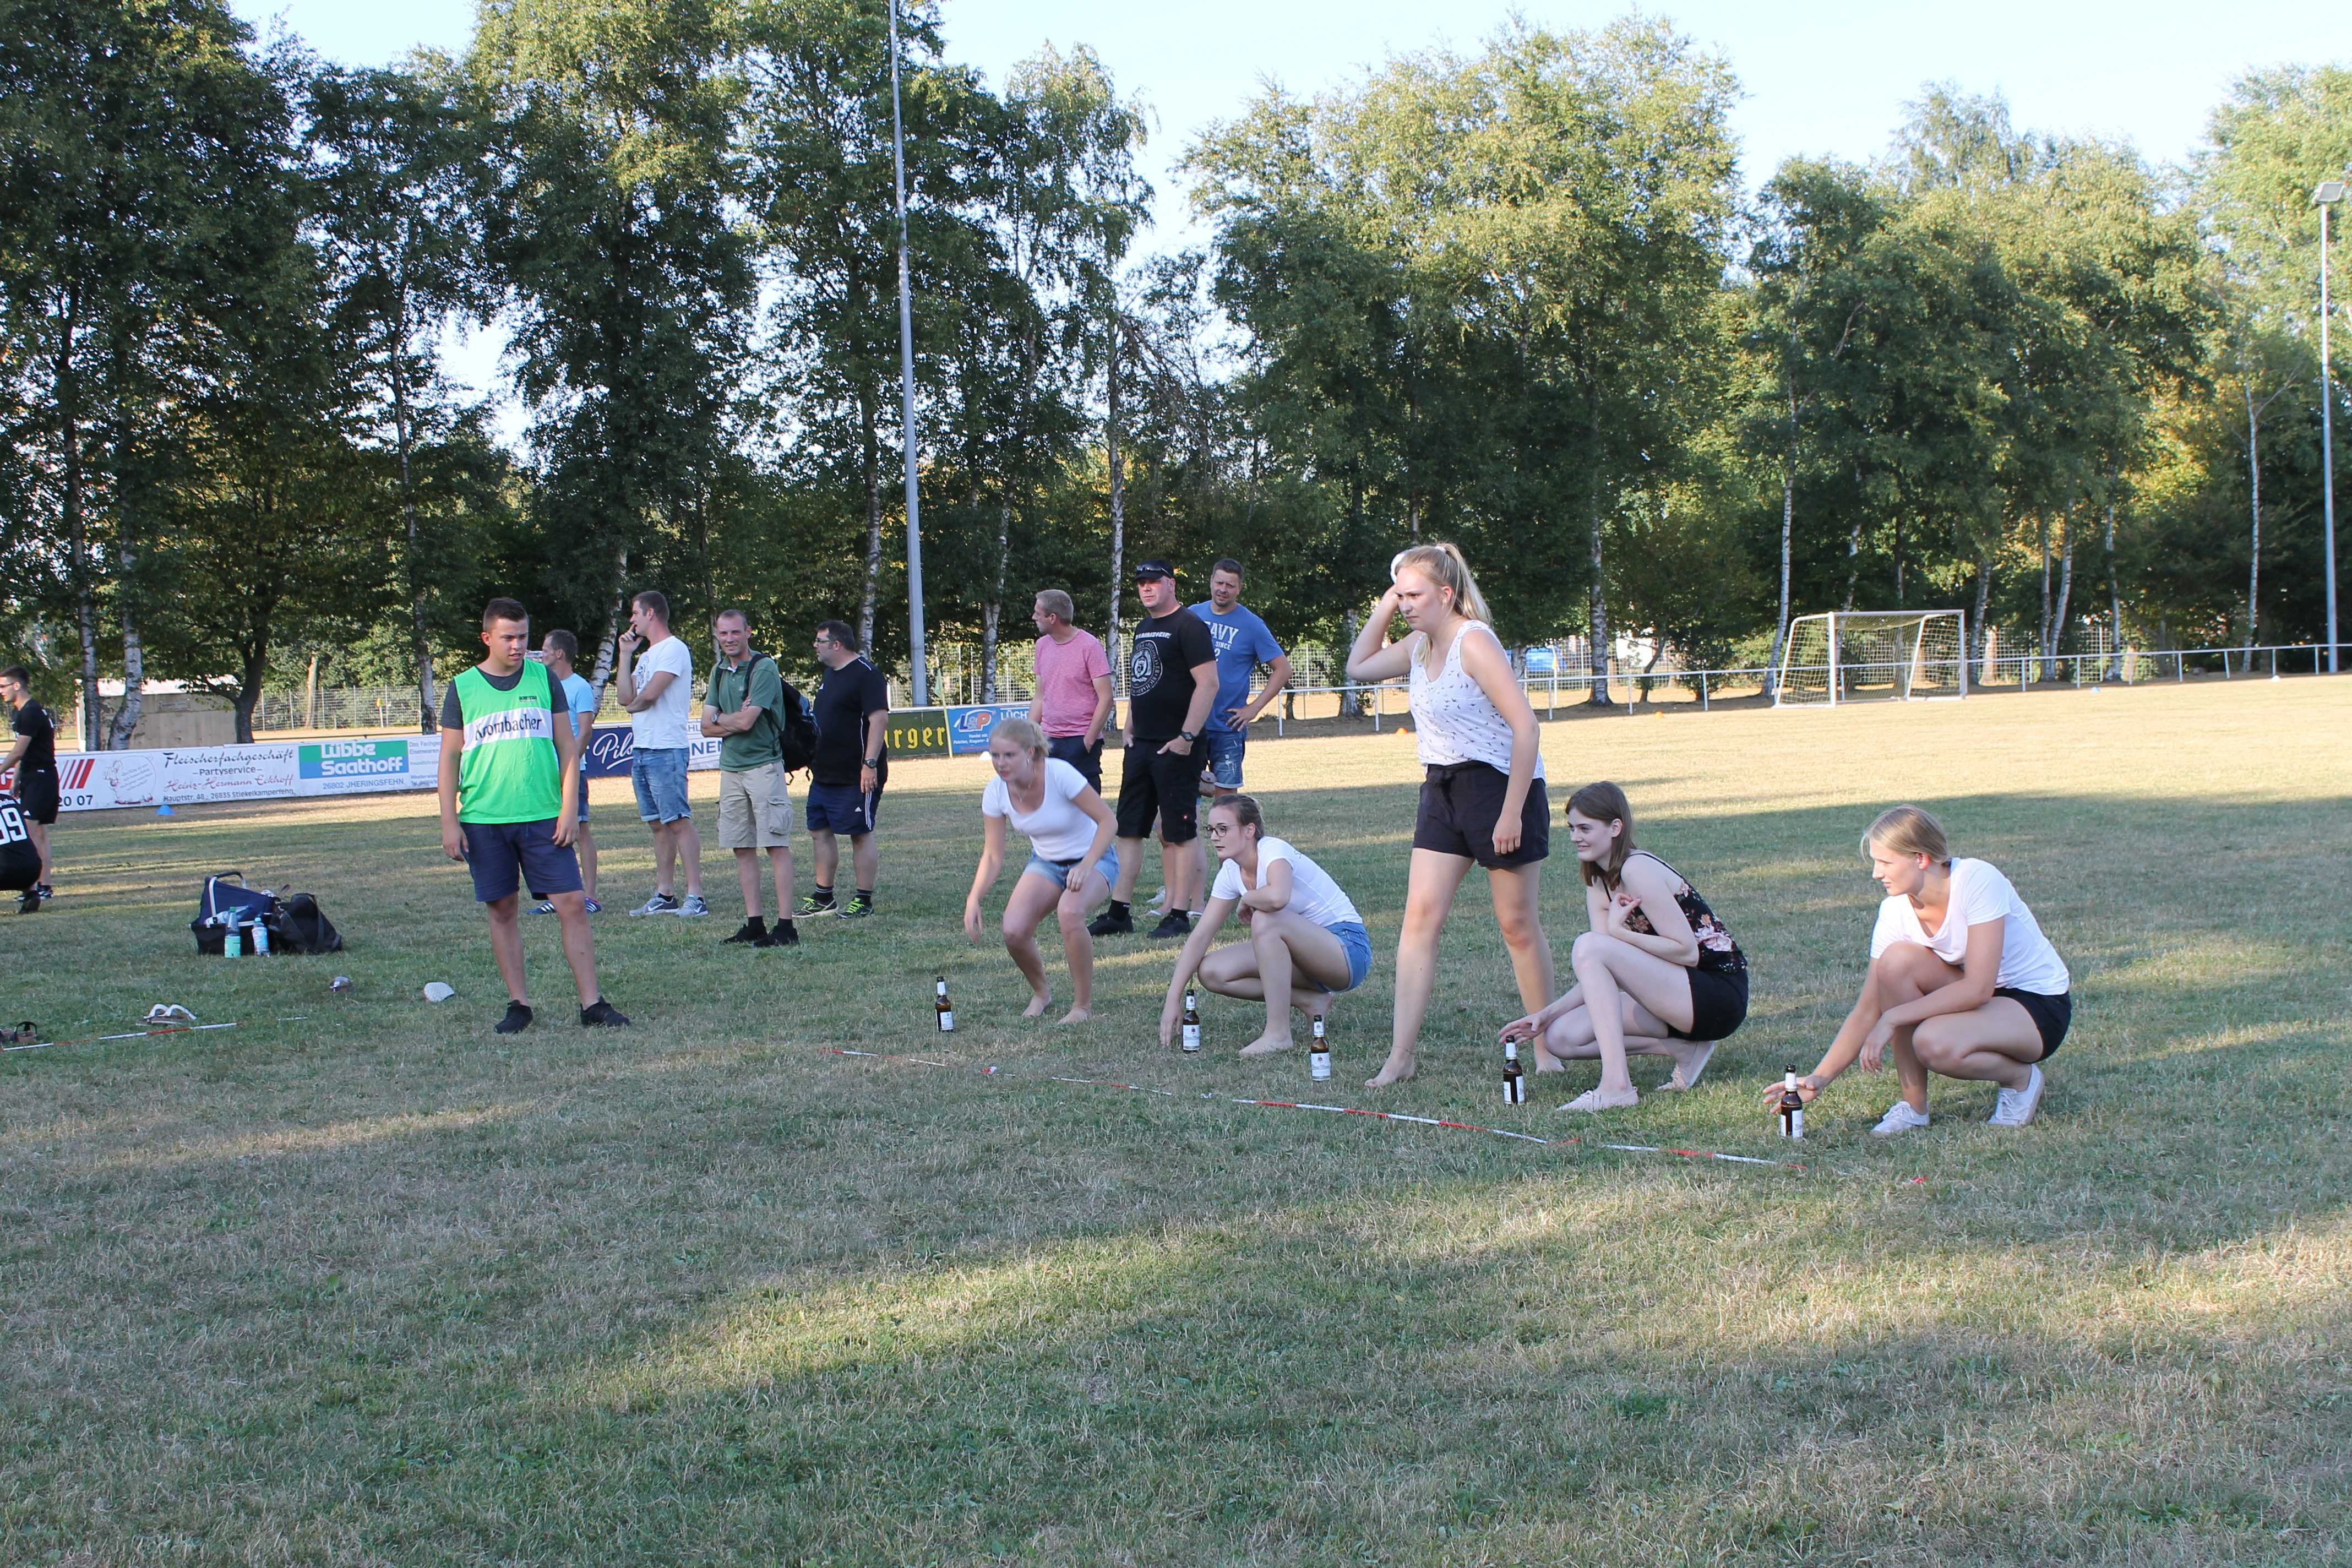 2018-07-27 Sportwoche - Flunkyball Turnier (18)